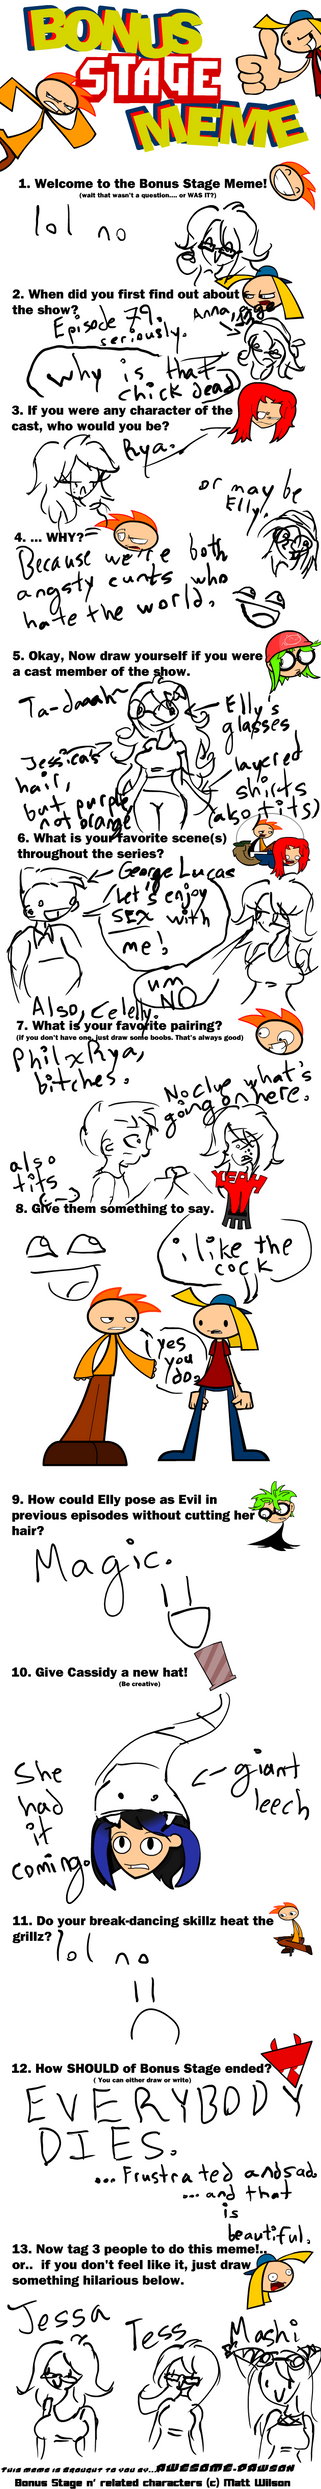 Bonus Stage Meme by gleefulcynic